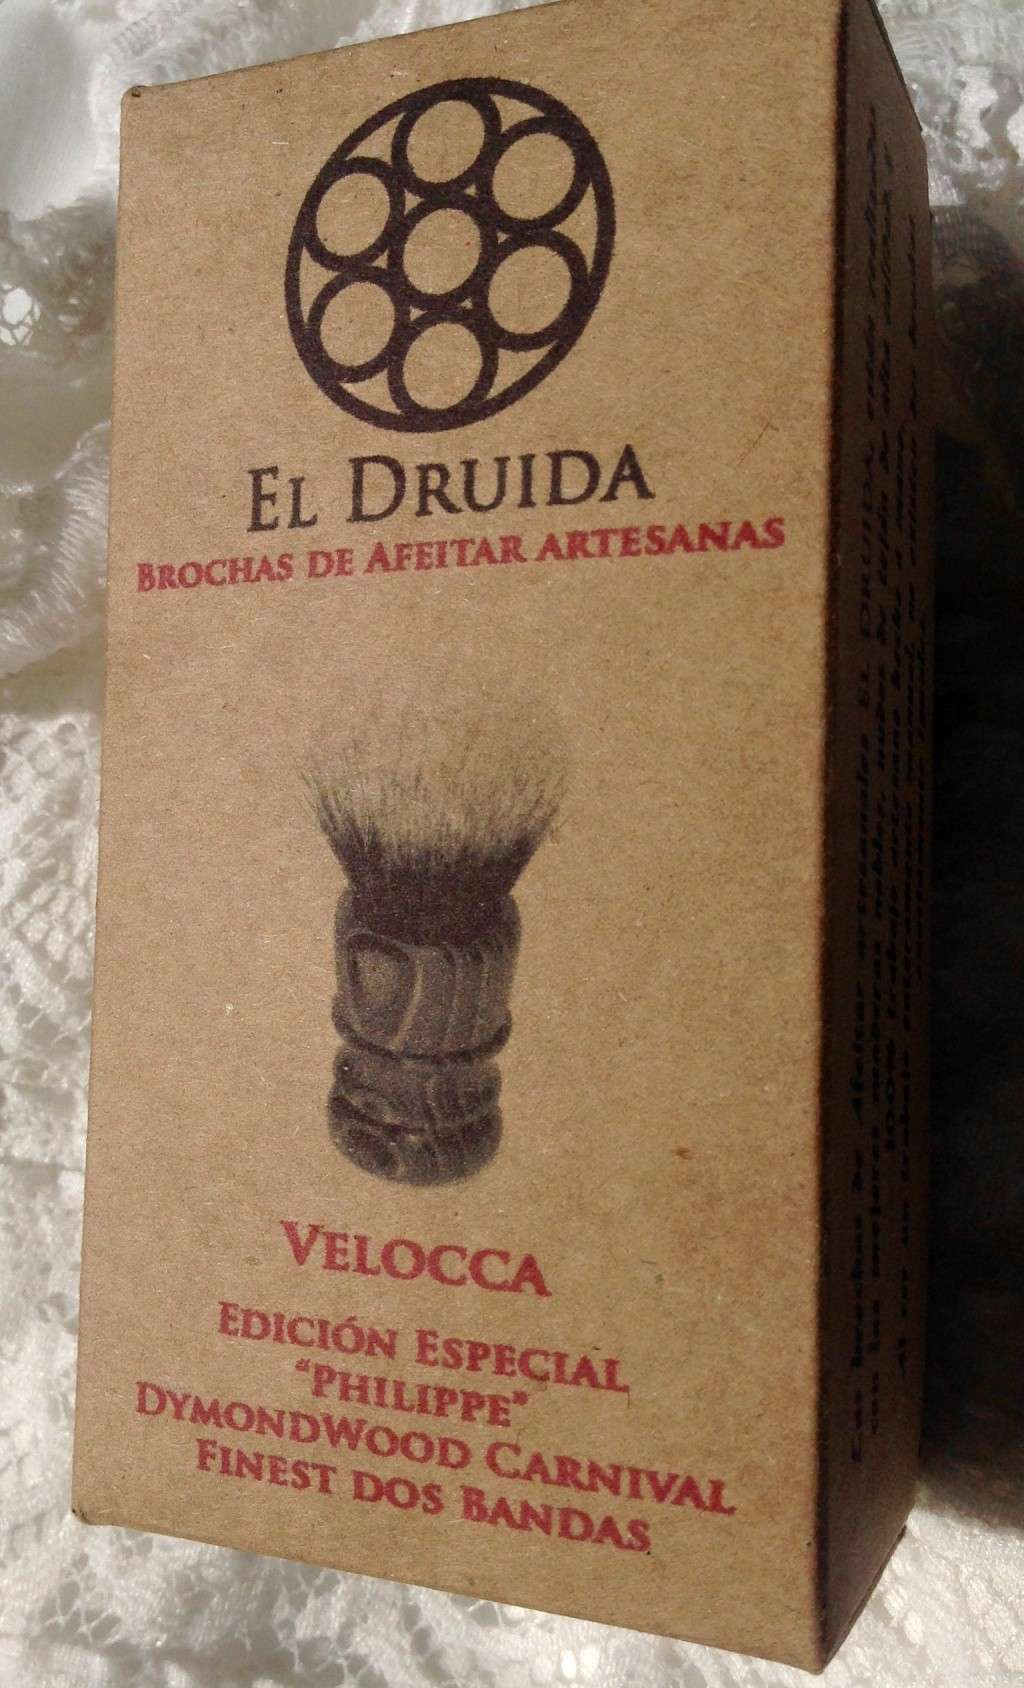 "El Druida Velocca en Dymondwood ""Carnival"" Finest 2 band 24x50 01aeba10"